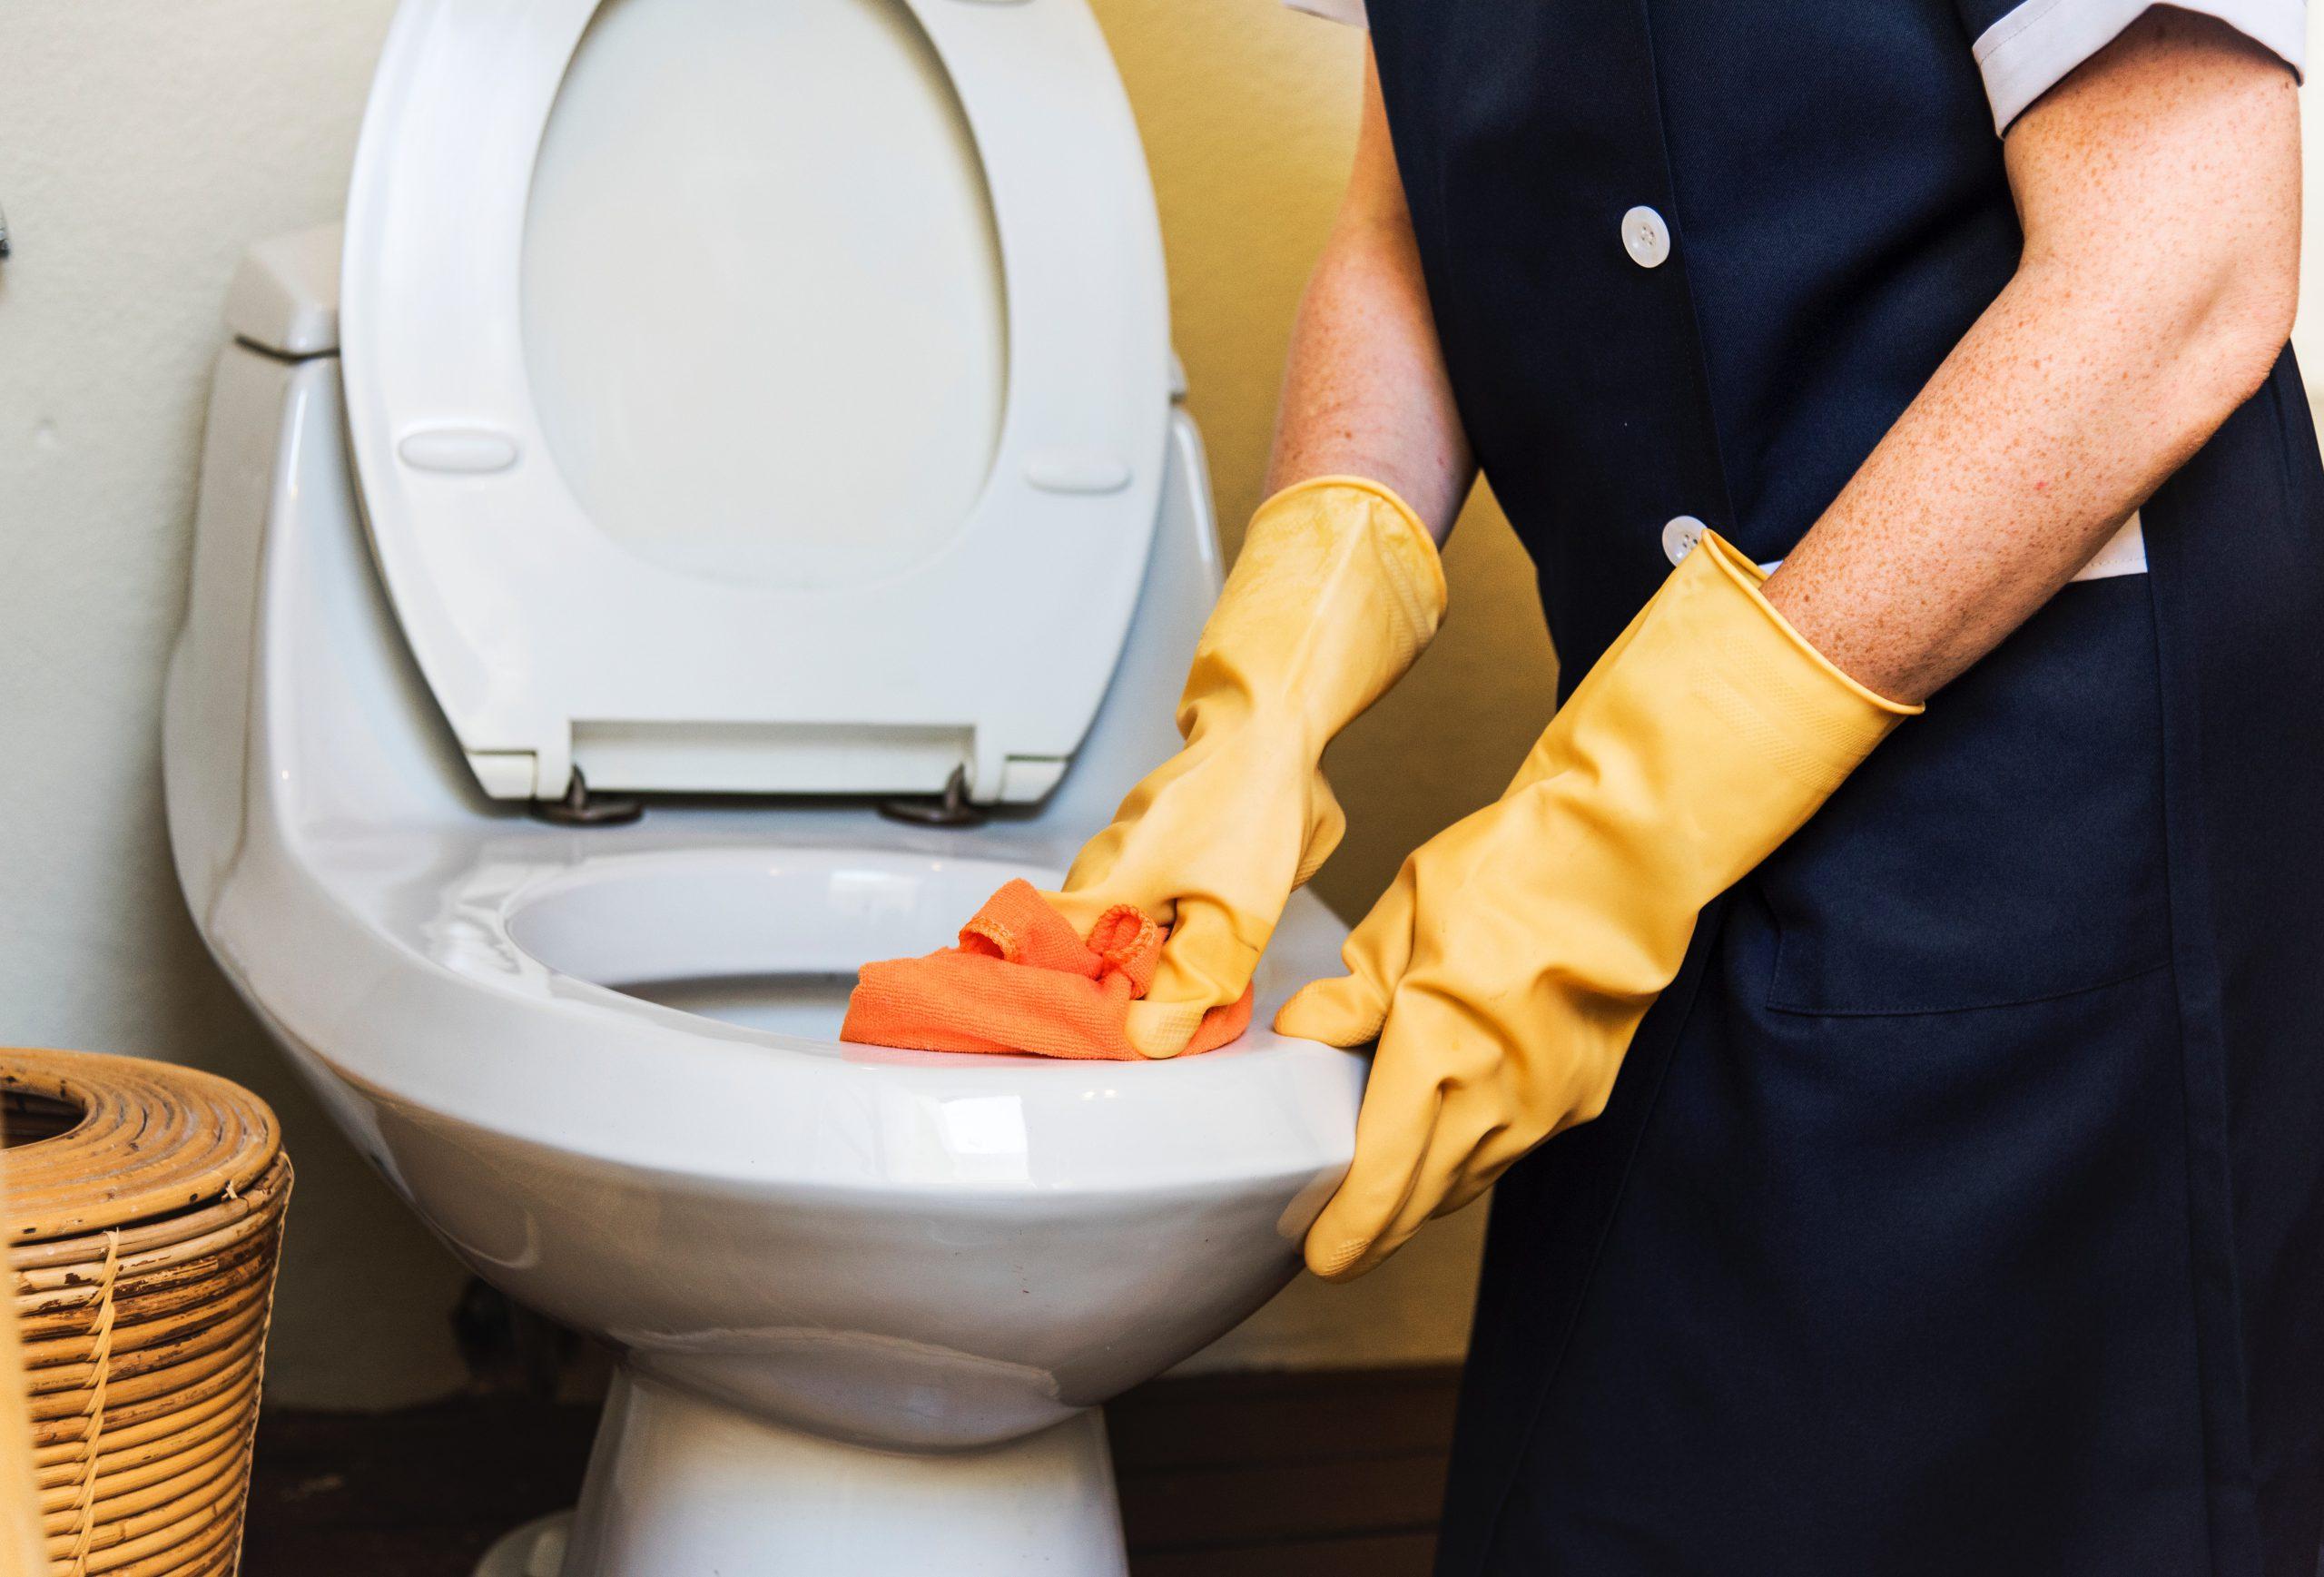 a host cleaning their bathroom